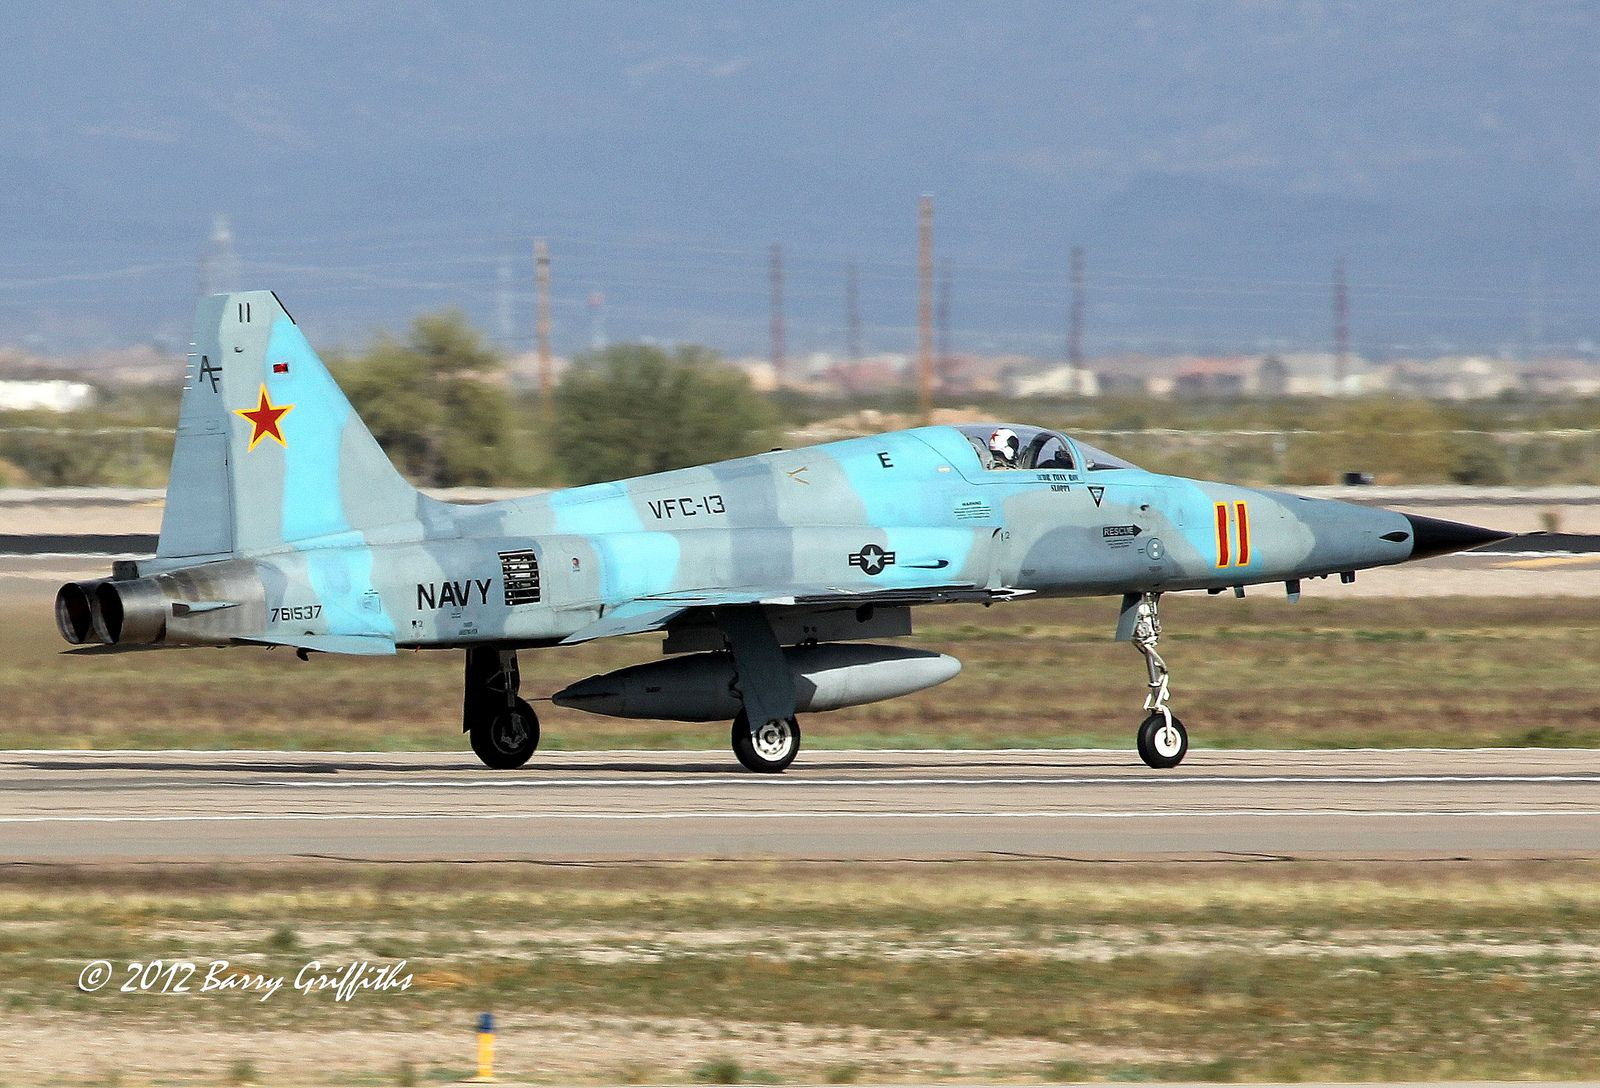 Northrop F5N Tiger II US Navy 761537 VFC13 Aggressor